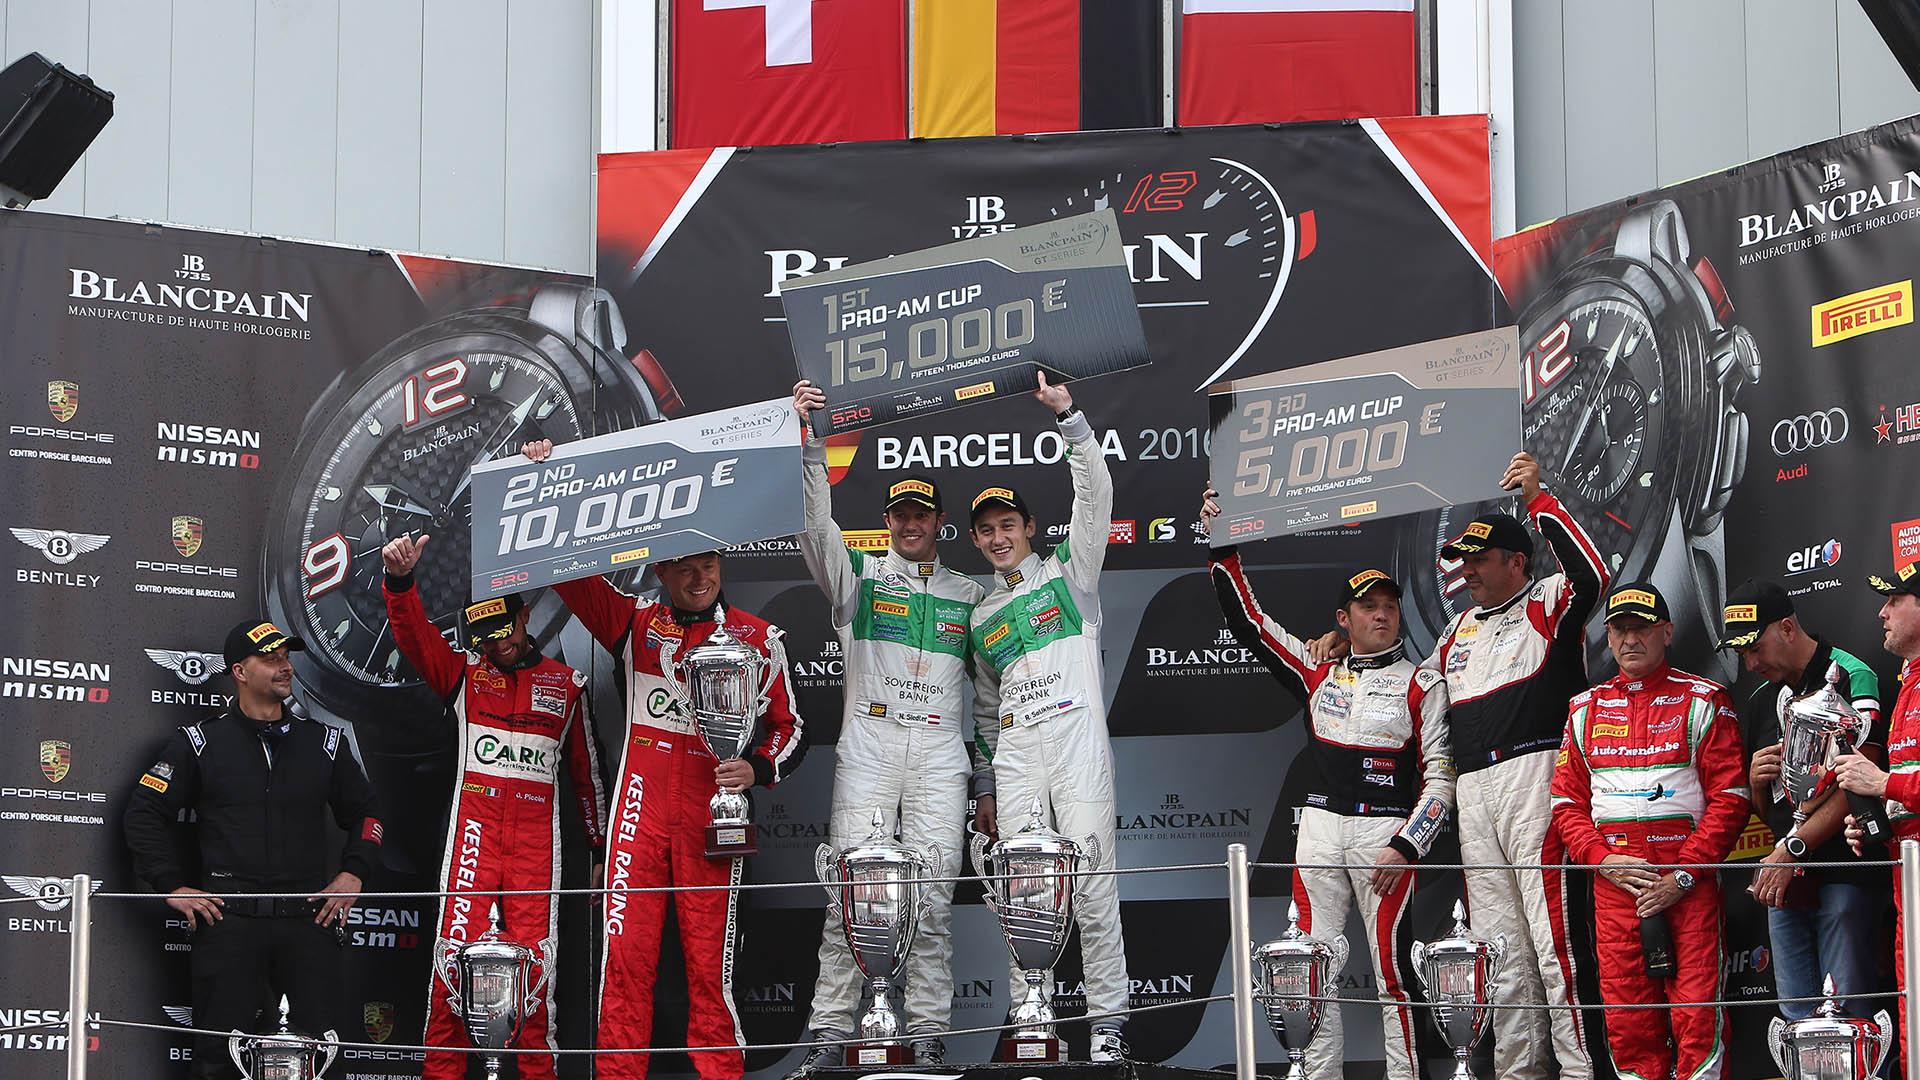 Klassensieg für Norbert Siedler beim Blancpain Sprint Cup in Barcelona